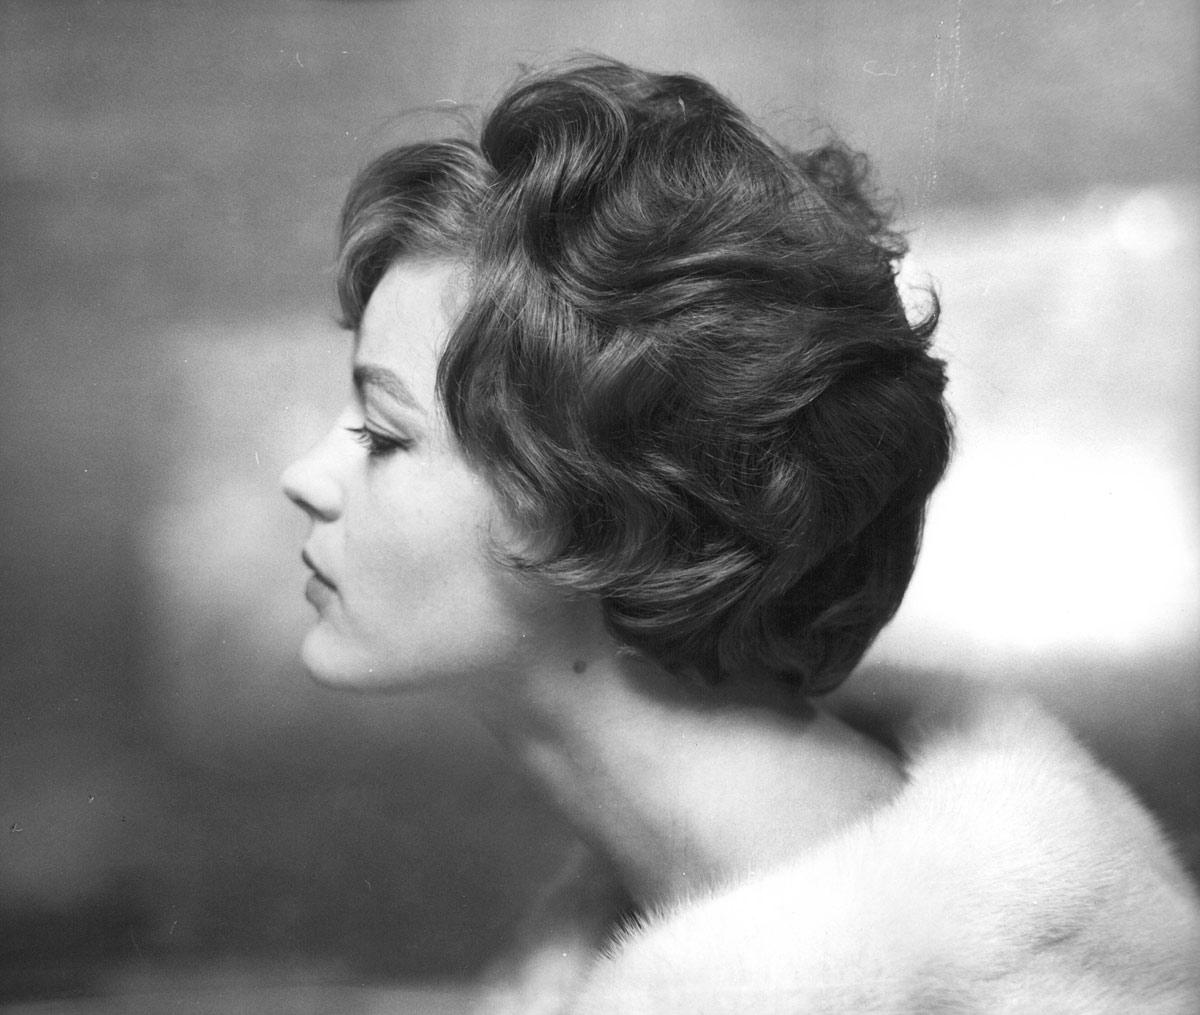 Connu Romy Schneider Venice 1957 | Art Blart QW63